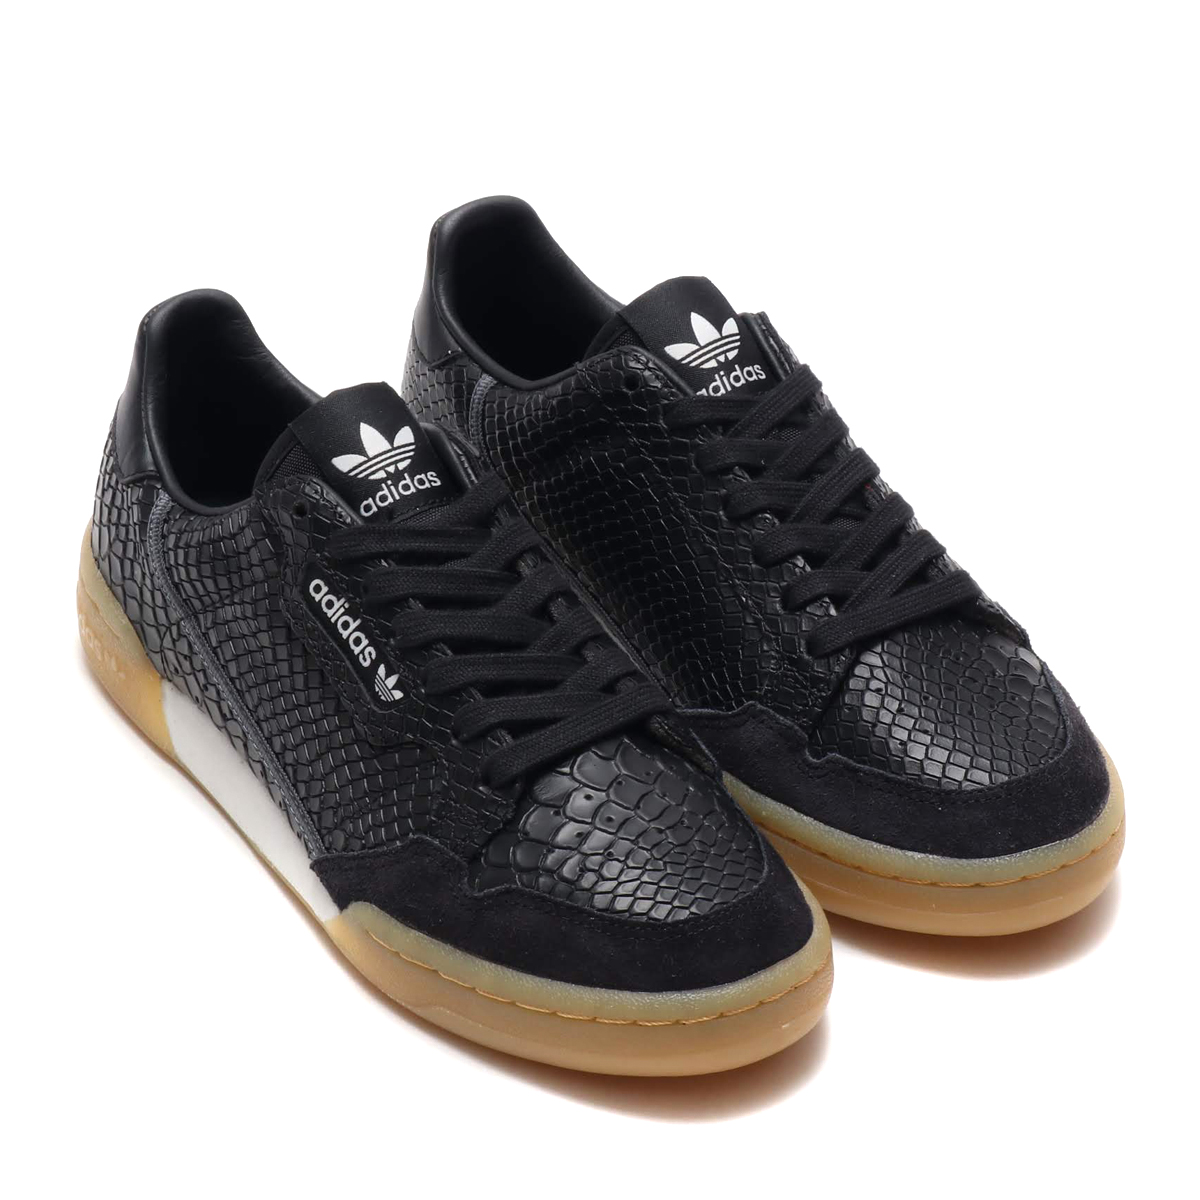 various colors 77d1d d2018 adidas CONTINENTAL 80 (Adidas Stan Smith W) core black / carbon S18/ gray  five F17 18FW-I